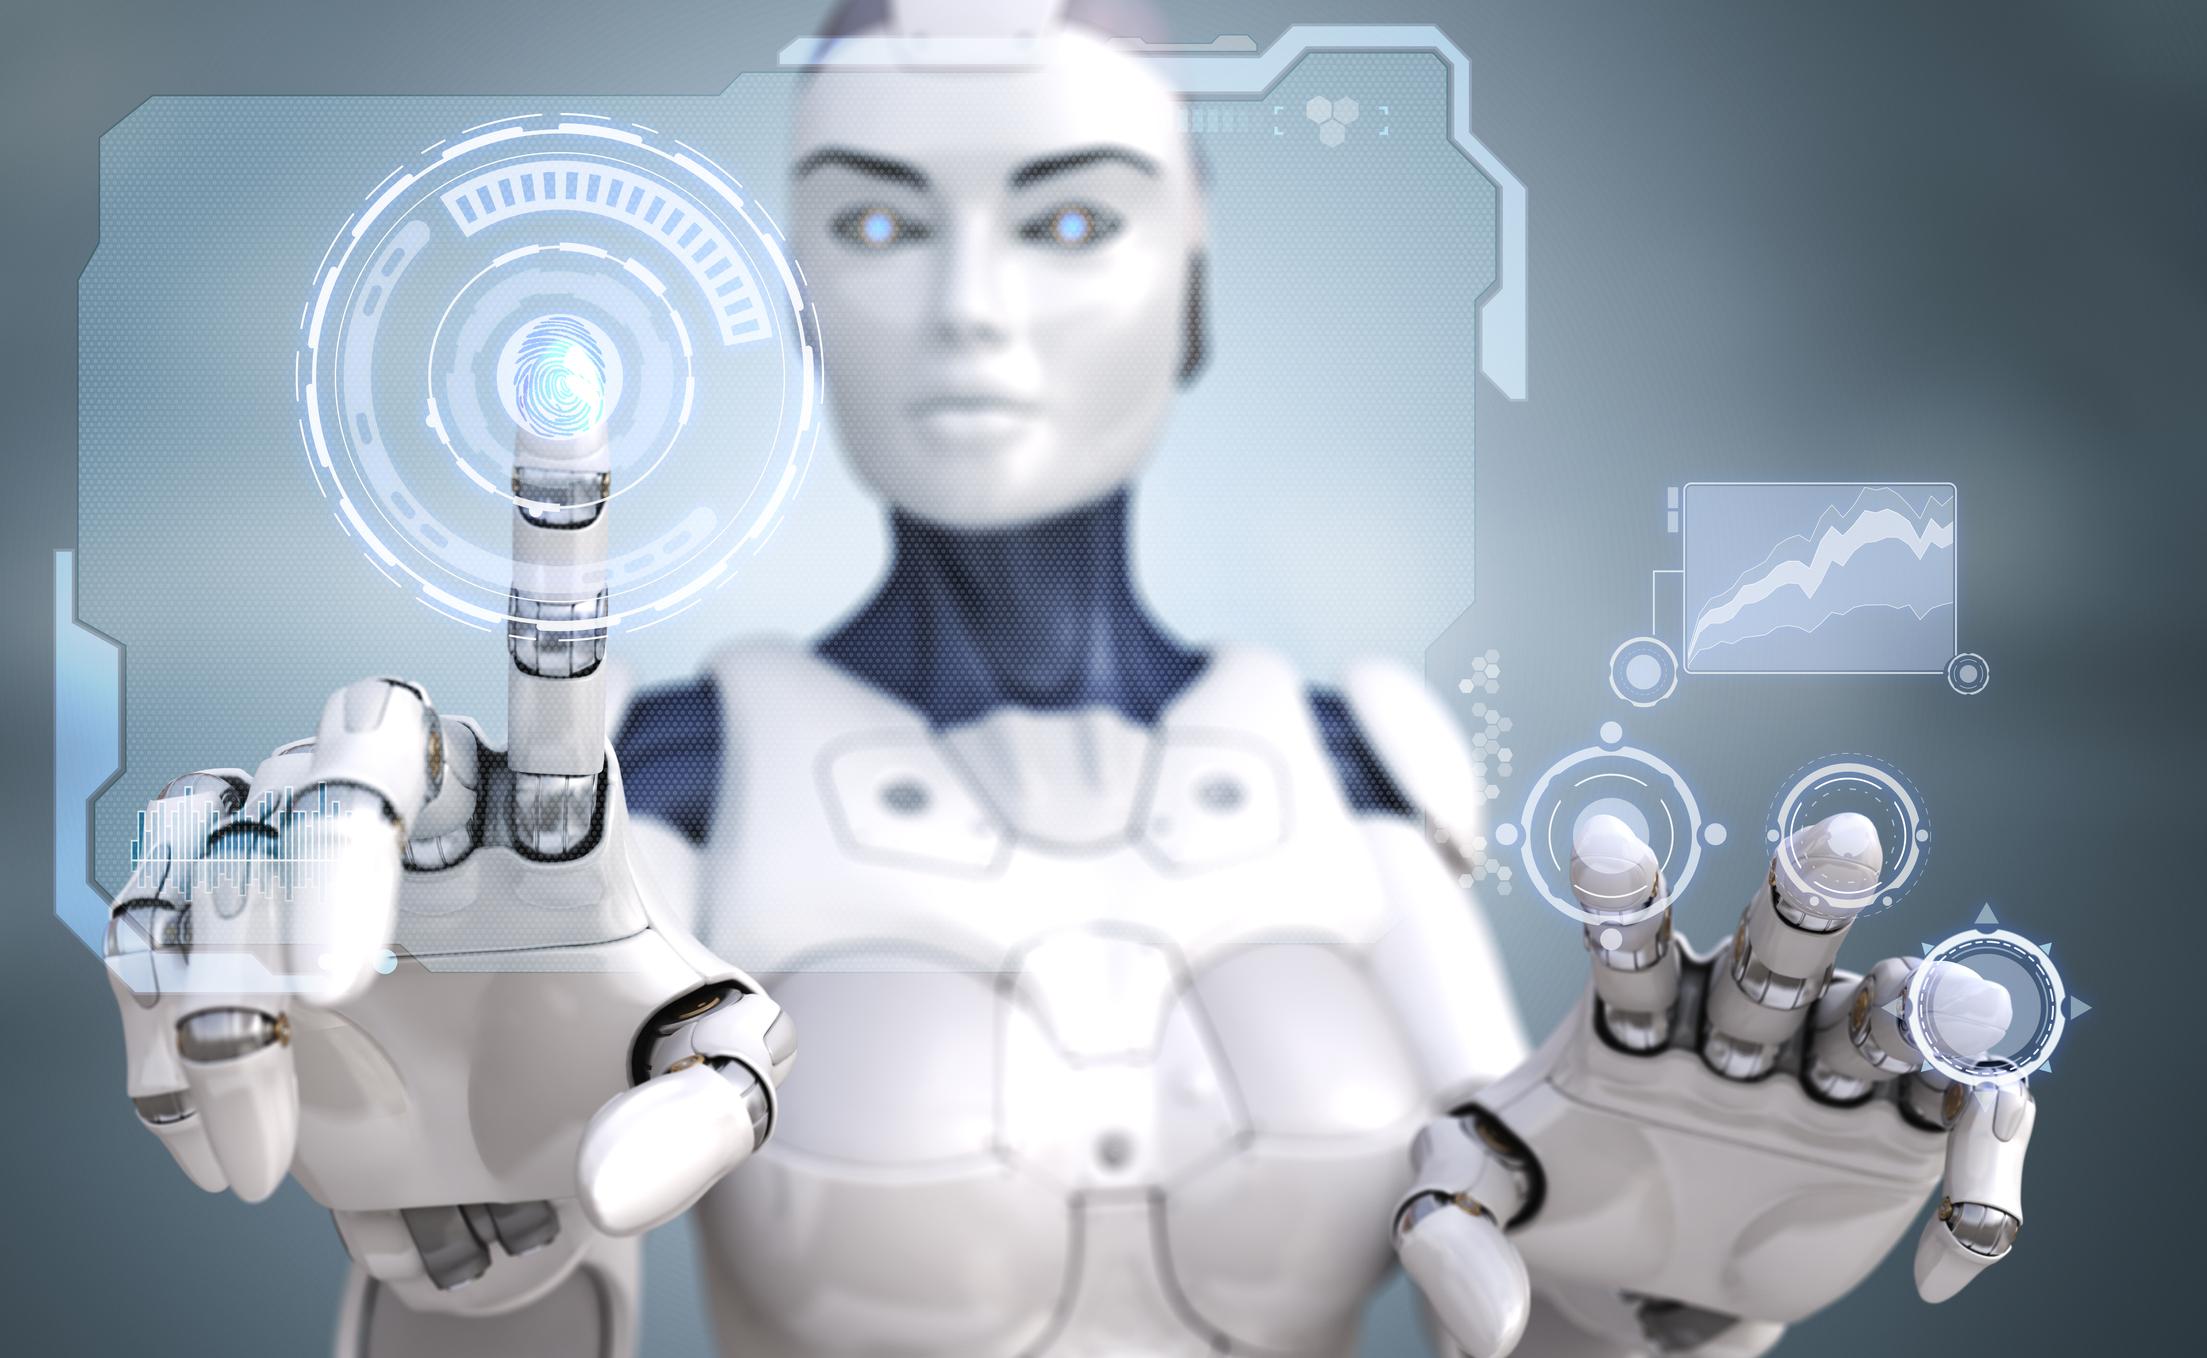 Standards-for-robot-ethics